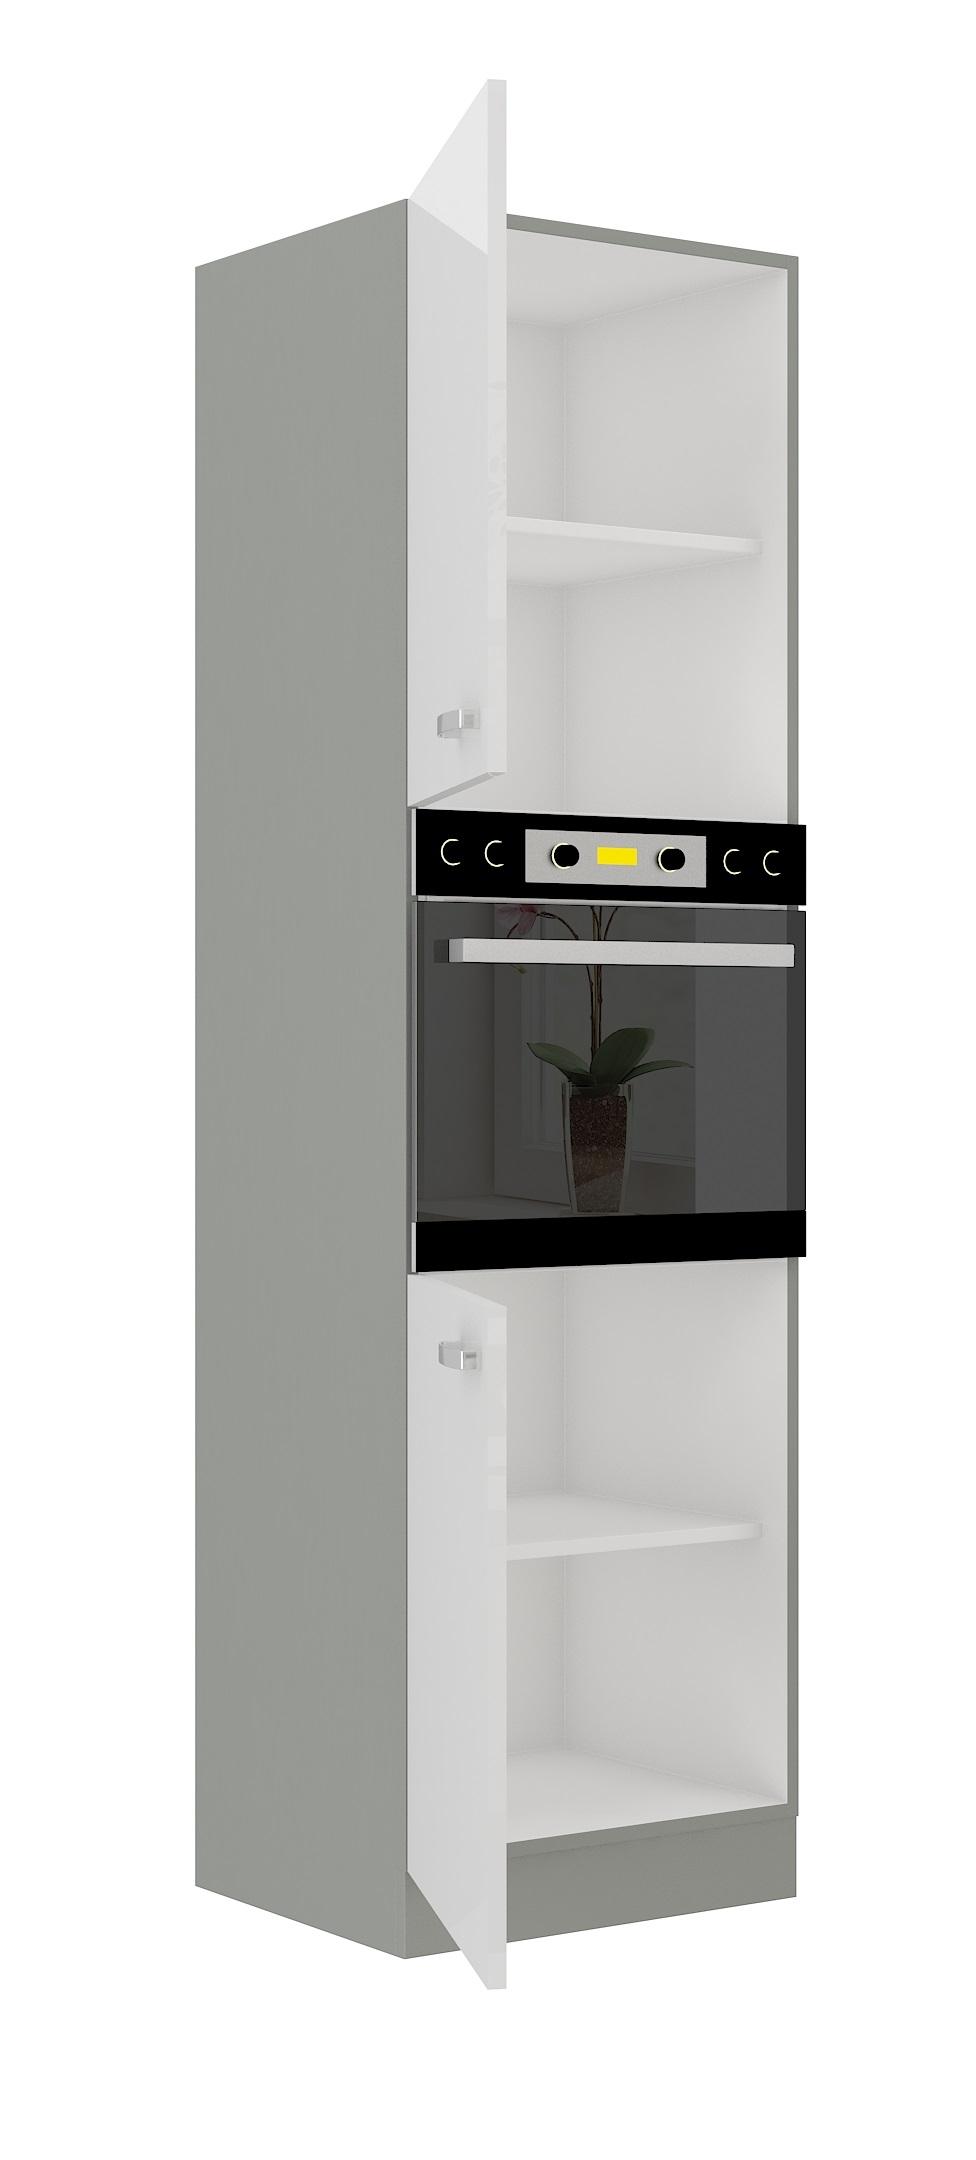 Full Size of Ikea Hochschrank Küche Hochschrank Küche Kühlschrank Hochschrank Küche Holz Hochschrank Küche Mit Auszug Küche Hochschrank Küche